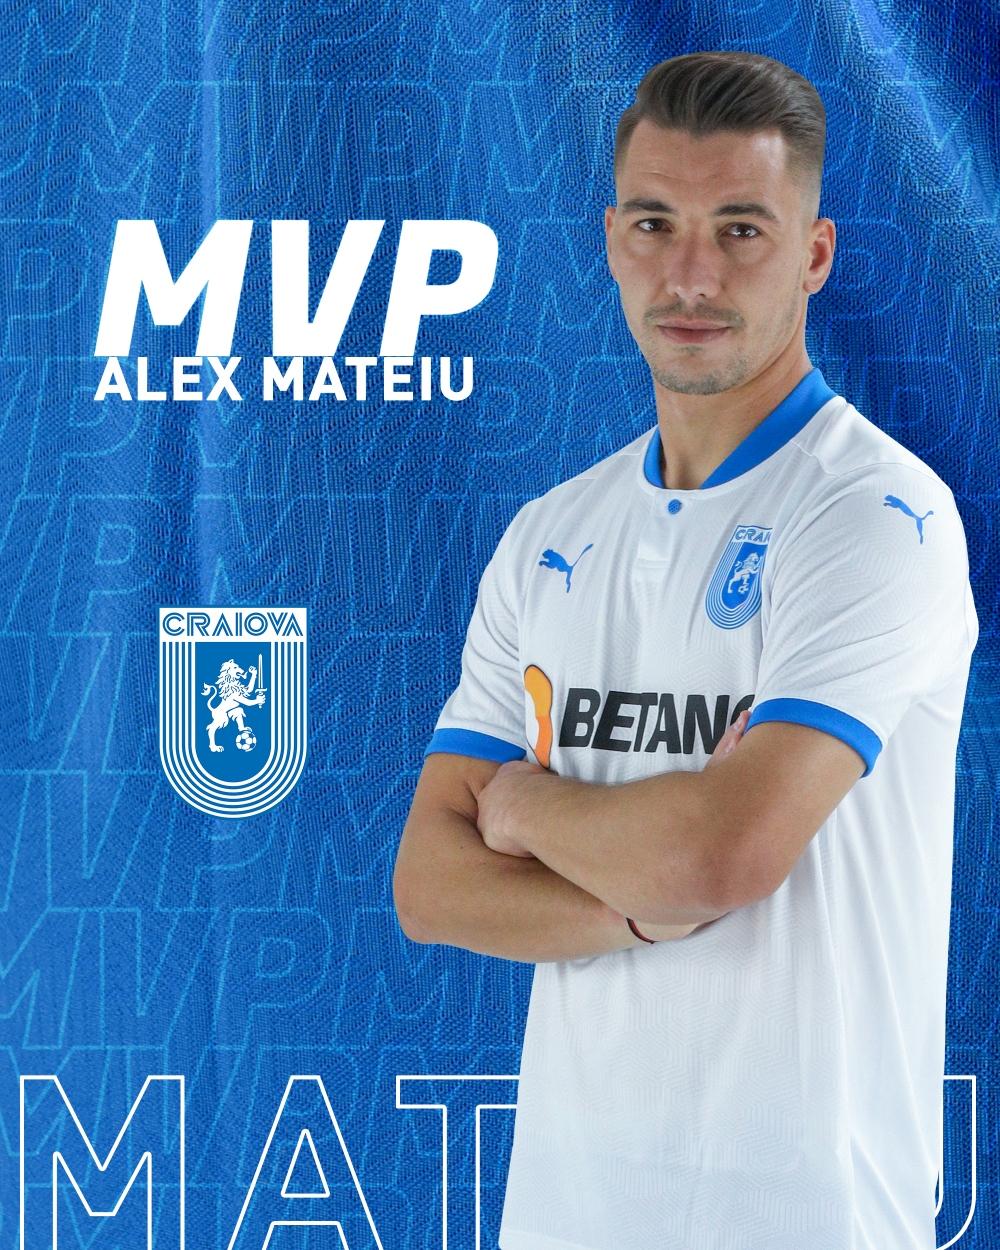 Mateiu - MVP